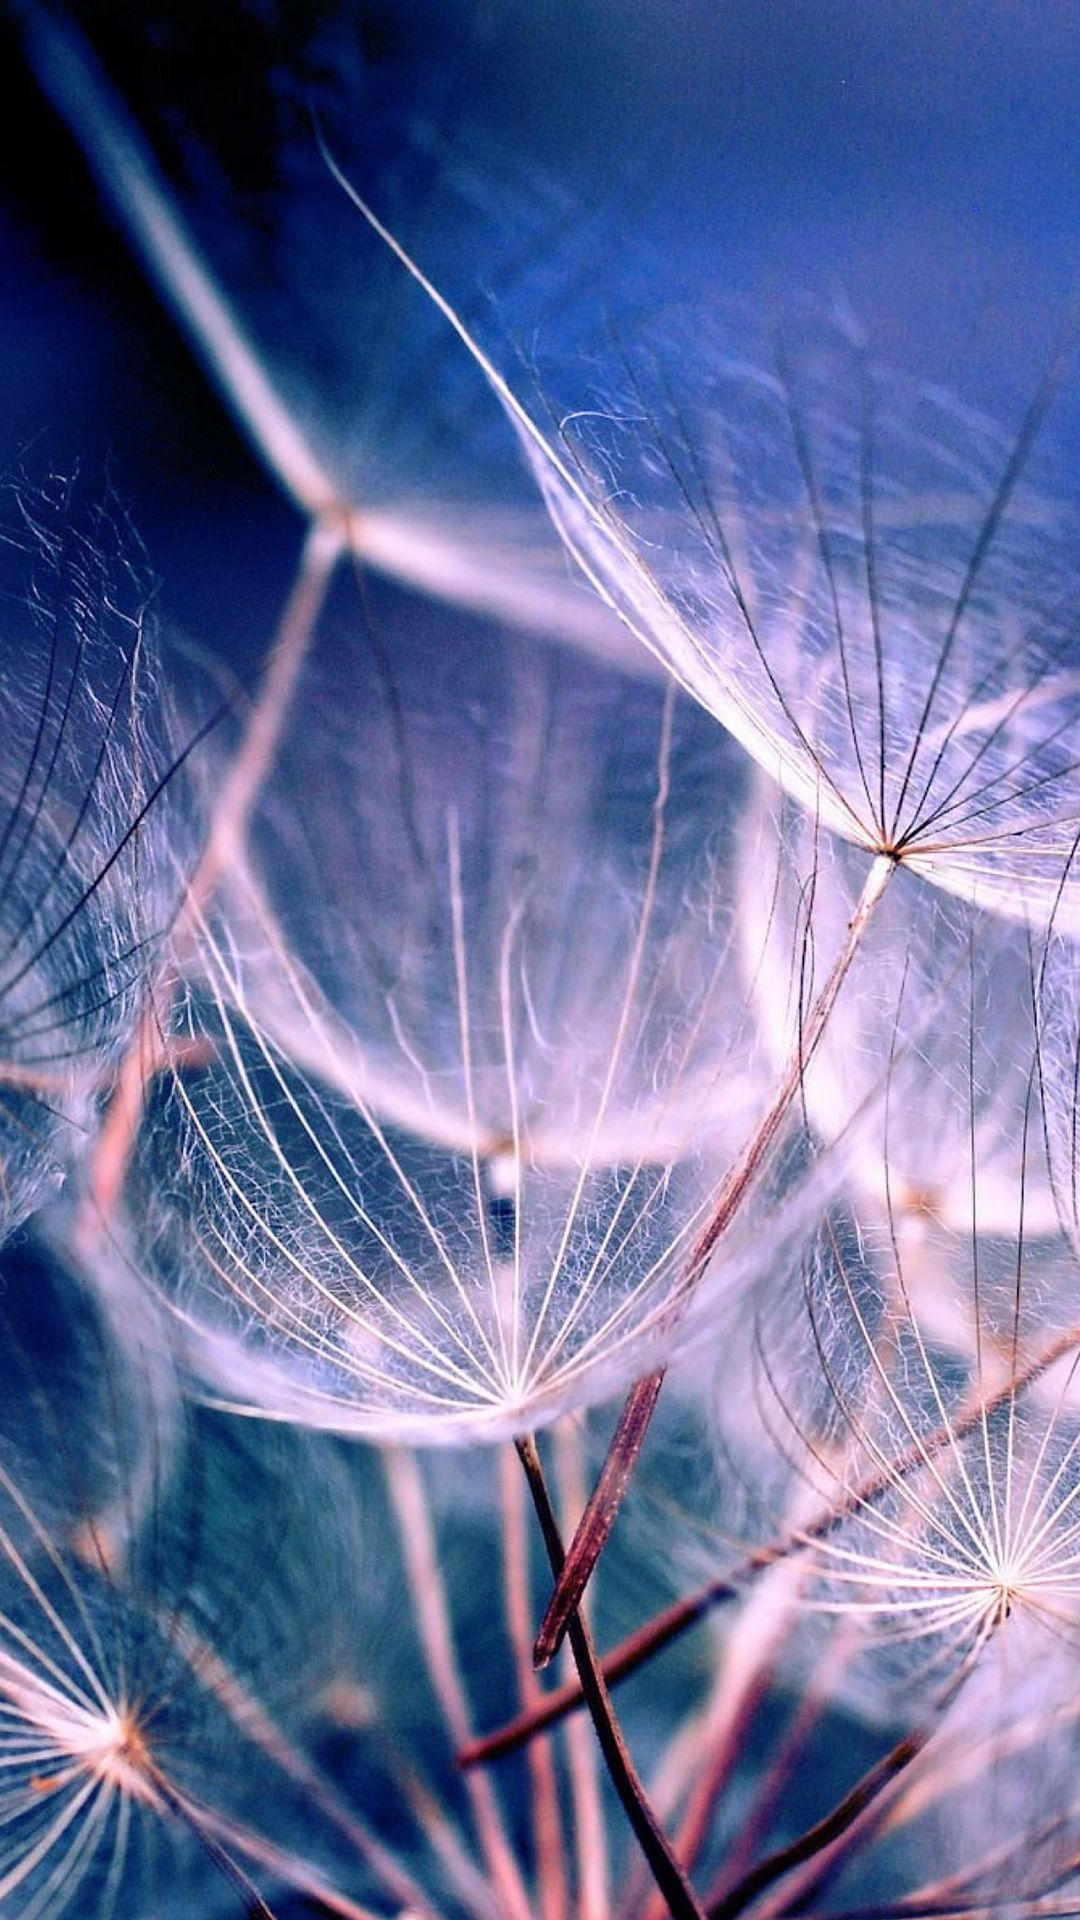 White Dandelions Flower Desktop IPhone 5 Wallpapers, Backgrounds, 640 X 1136